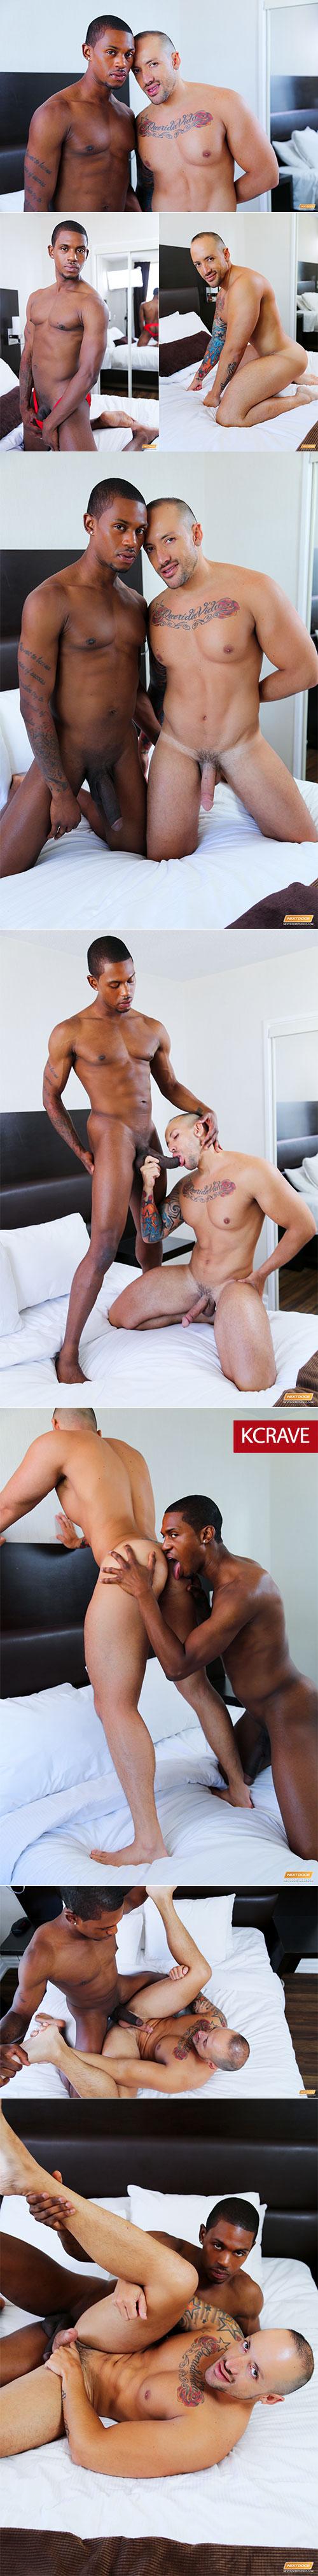 Jordano Santoro and Krave Moore